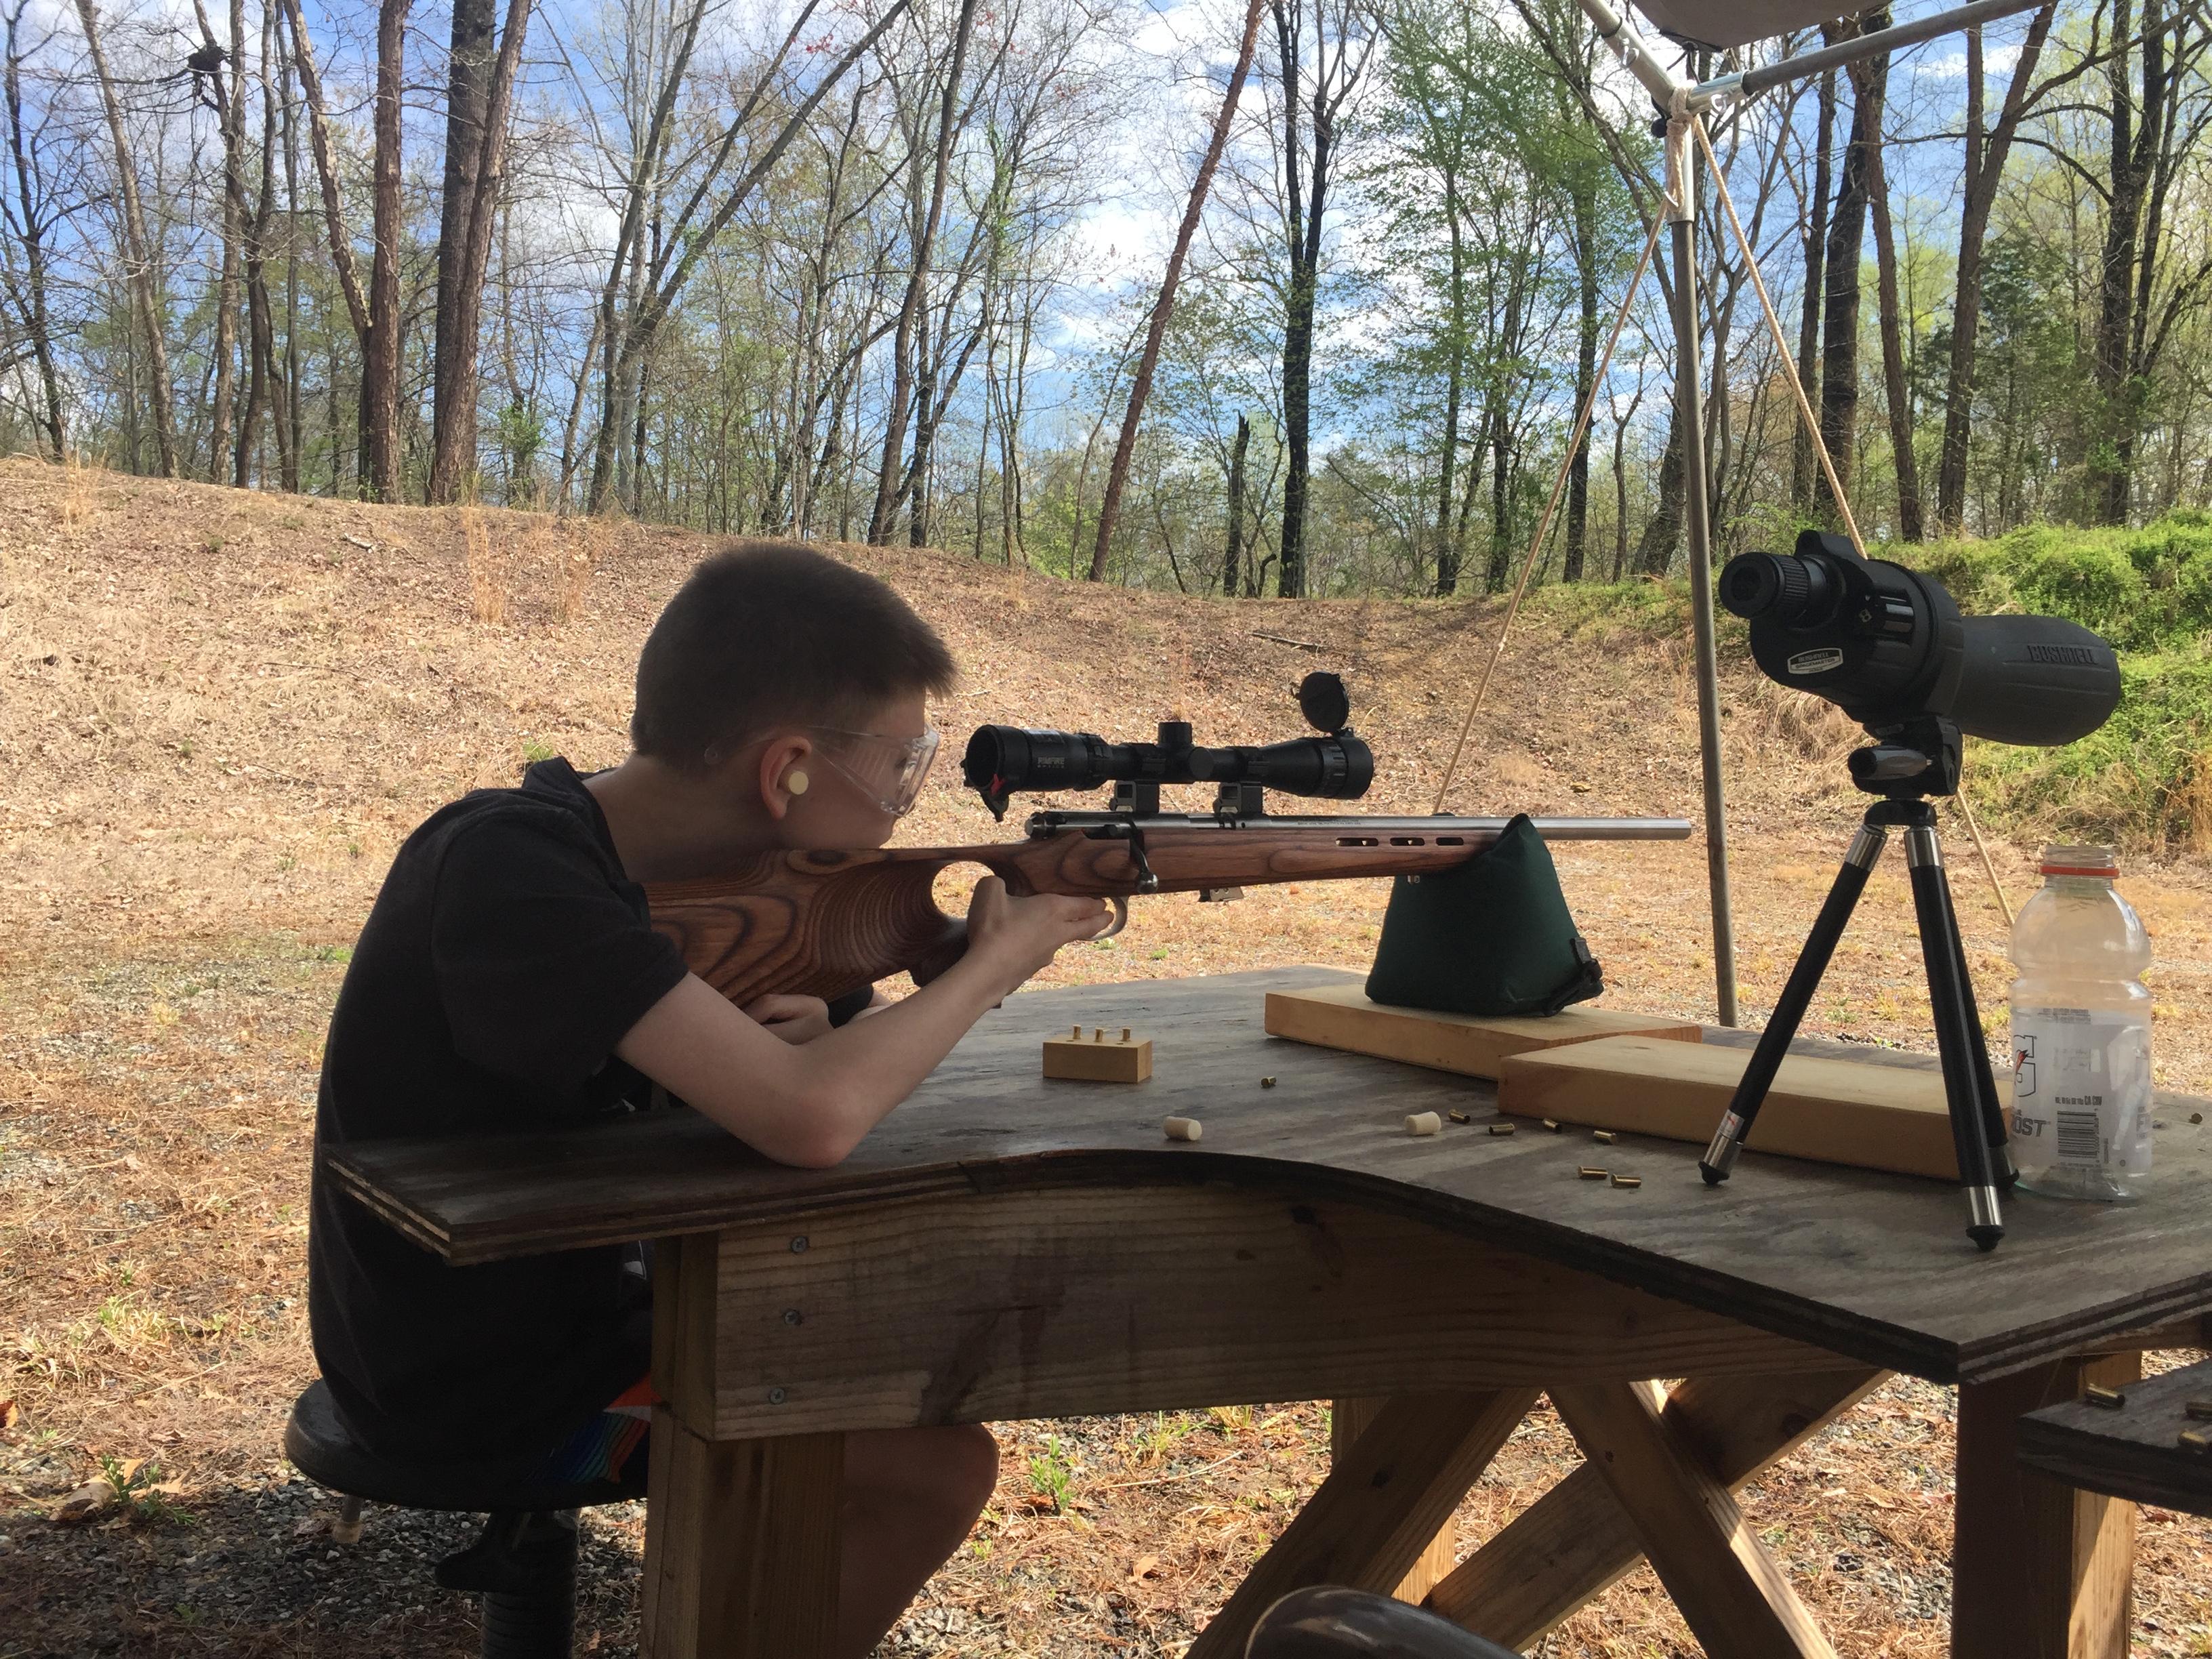 T179 Shooting 20196